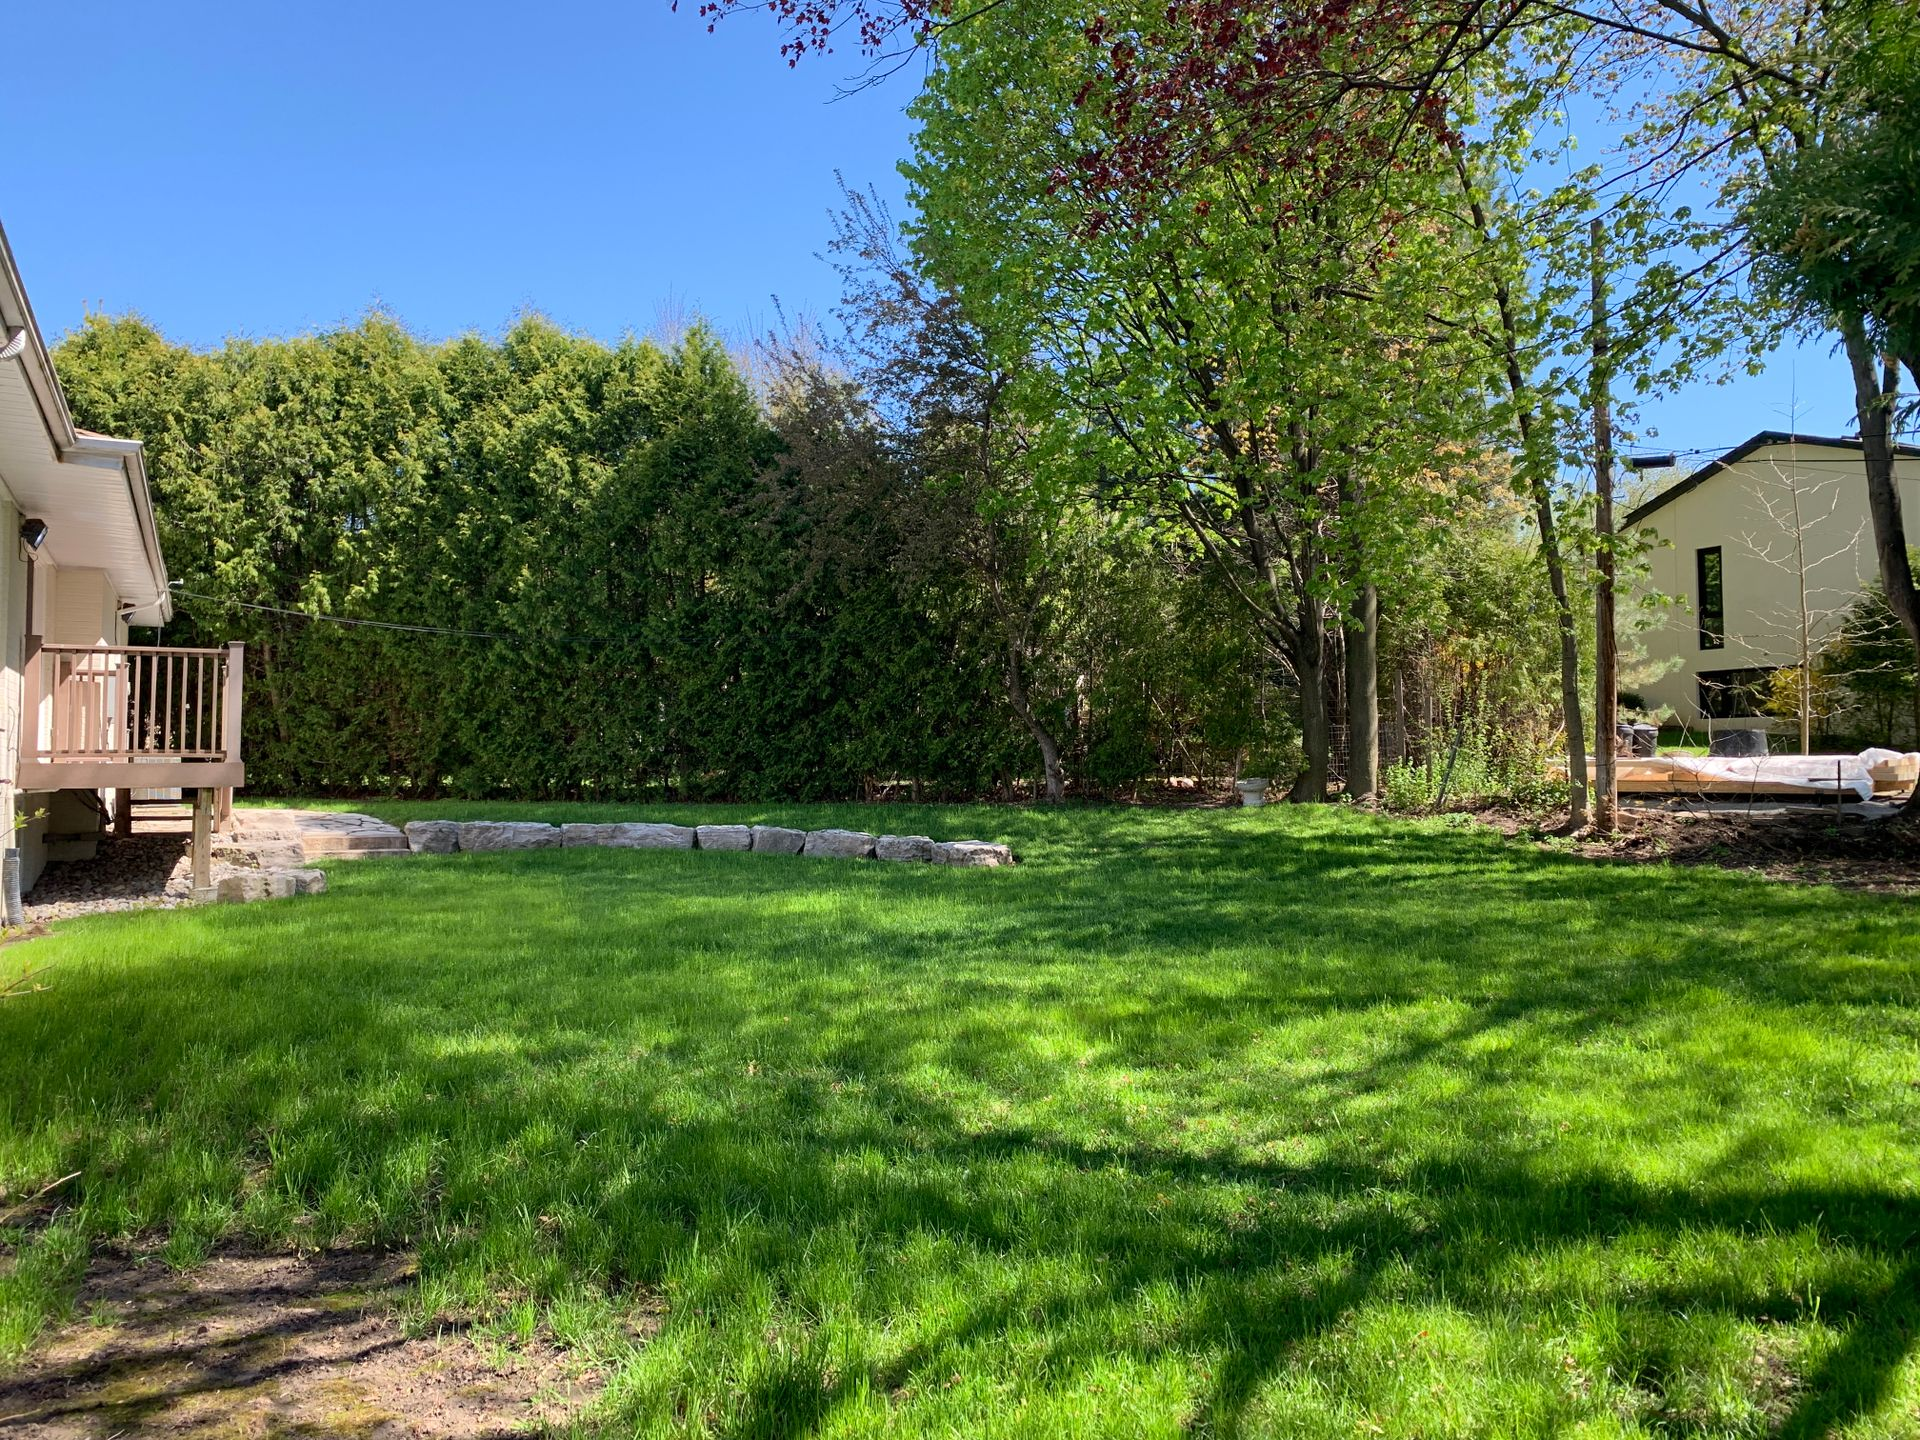 Backyard at 11 Tetbury Crescent, Parkwoods-Donalda, Toronto